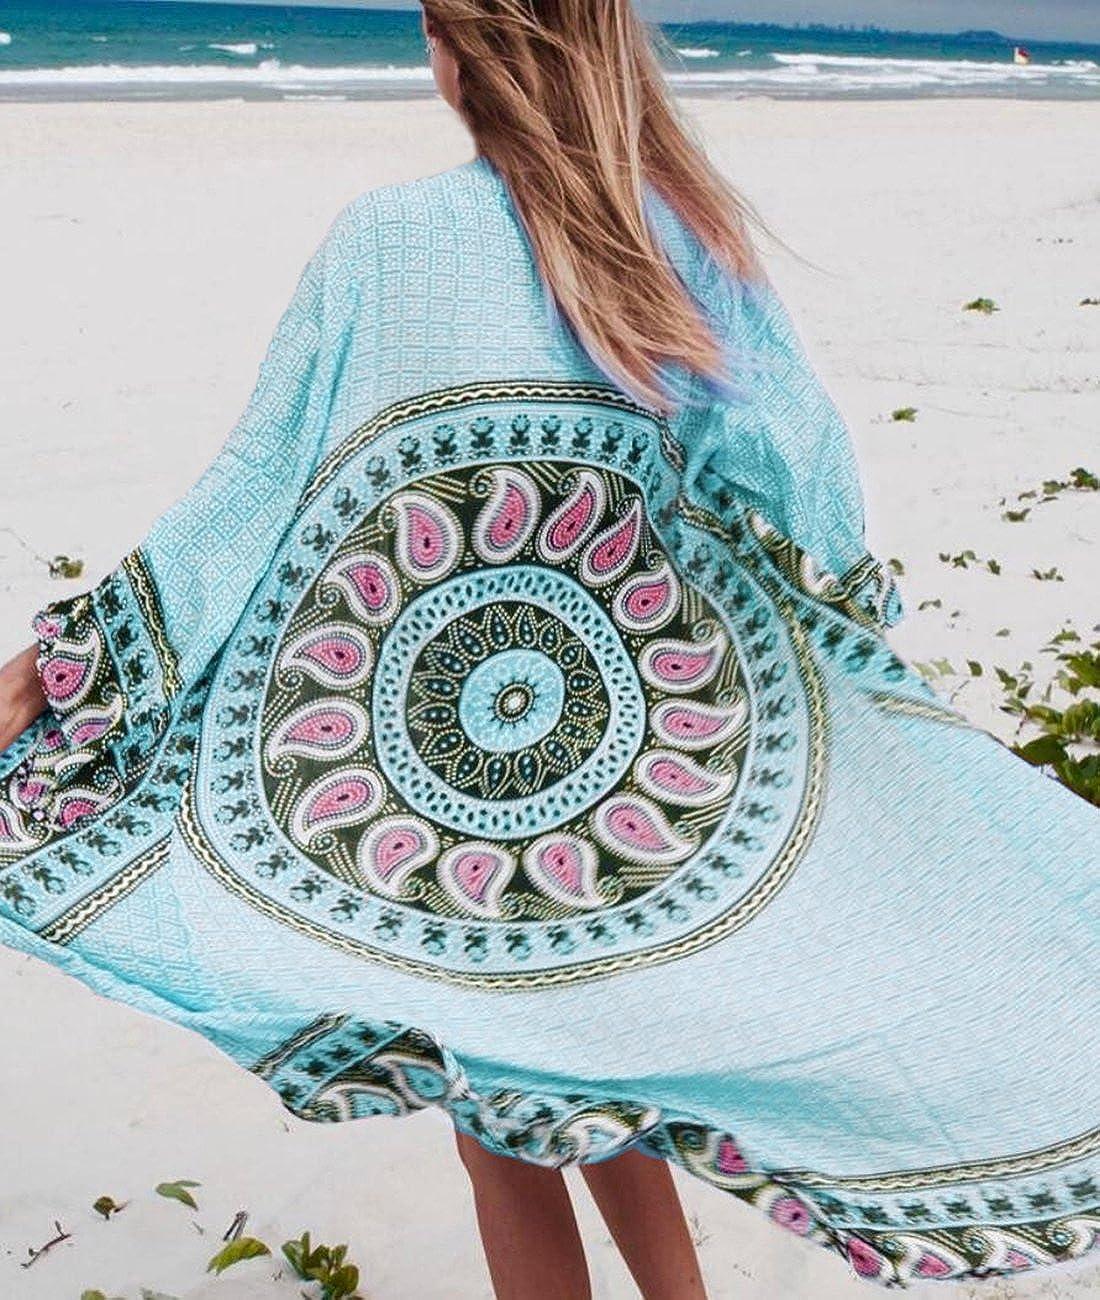 224d3fbc19d Sanifer Women s Boho Floral Printed Open Front Swimsuit Cover Up Plus Size  Long Beach Cover Up Kimono (Blue